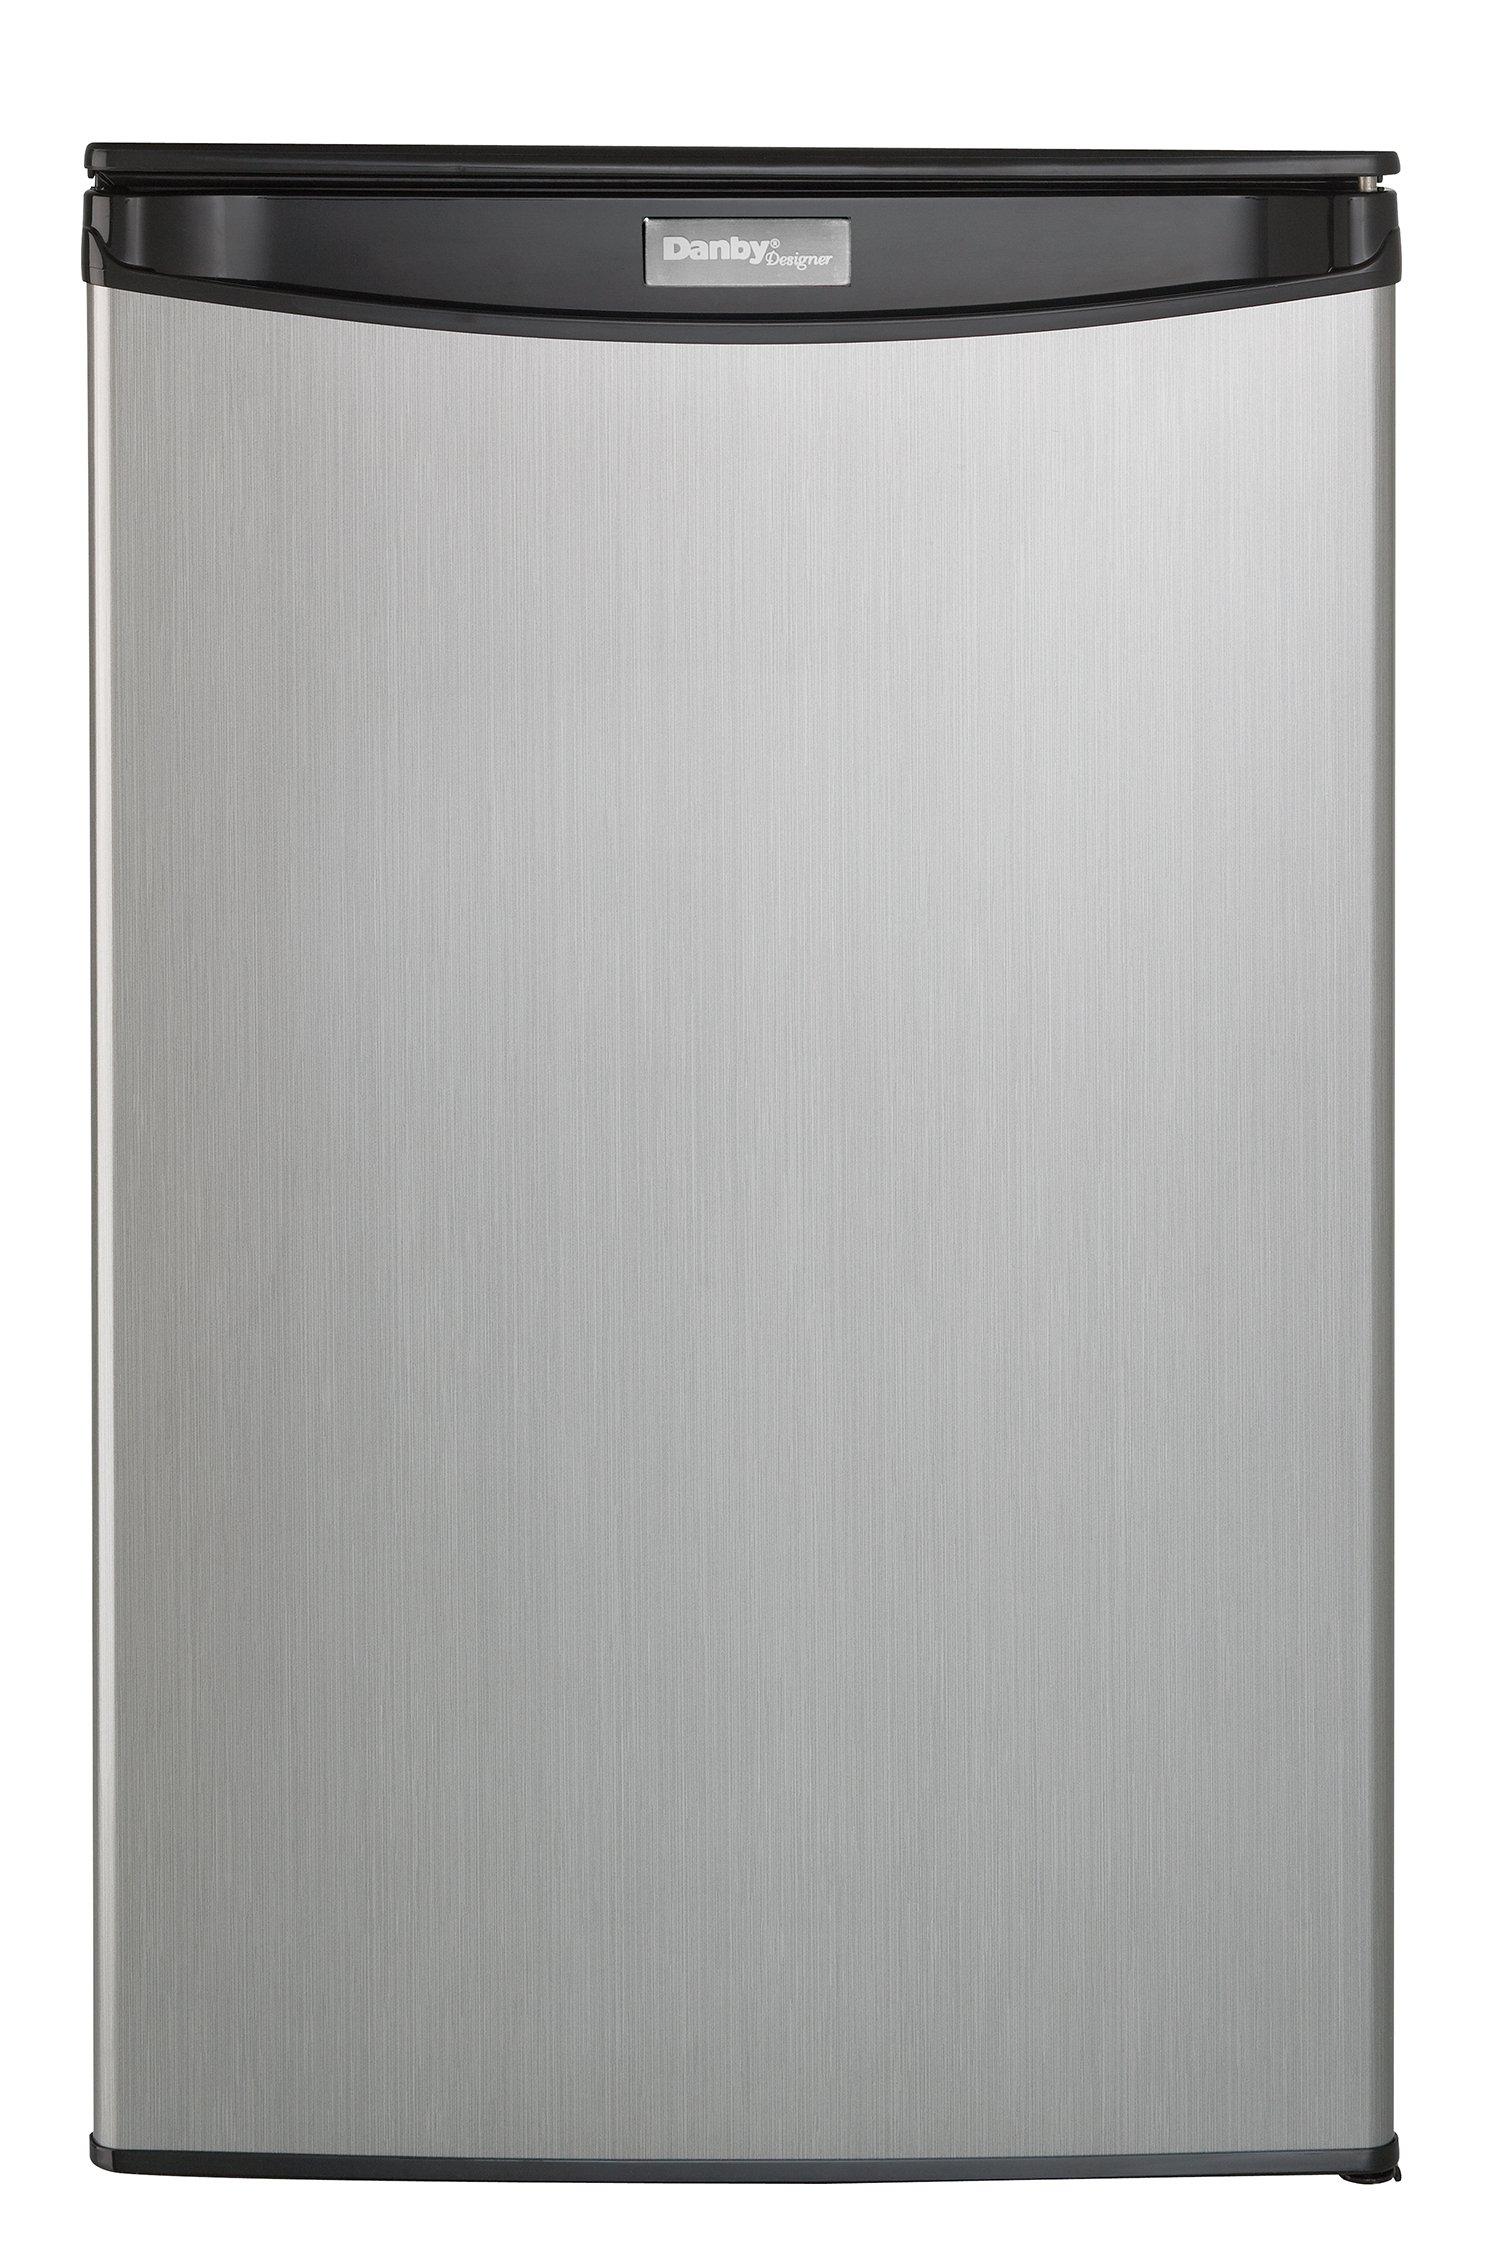 Danby DAR044A5BSLDD Compact Refrigerator, Spotless Steel Door, 4.4 Cubic Feet by Danby (Image #2)